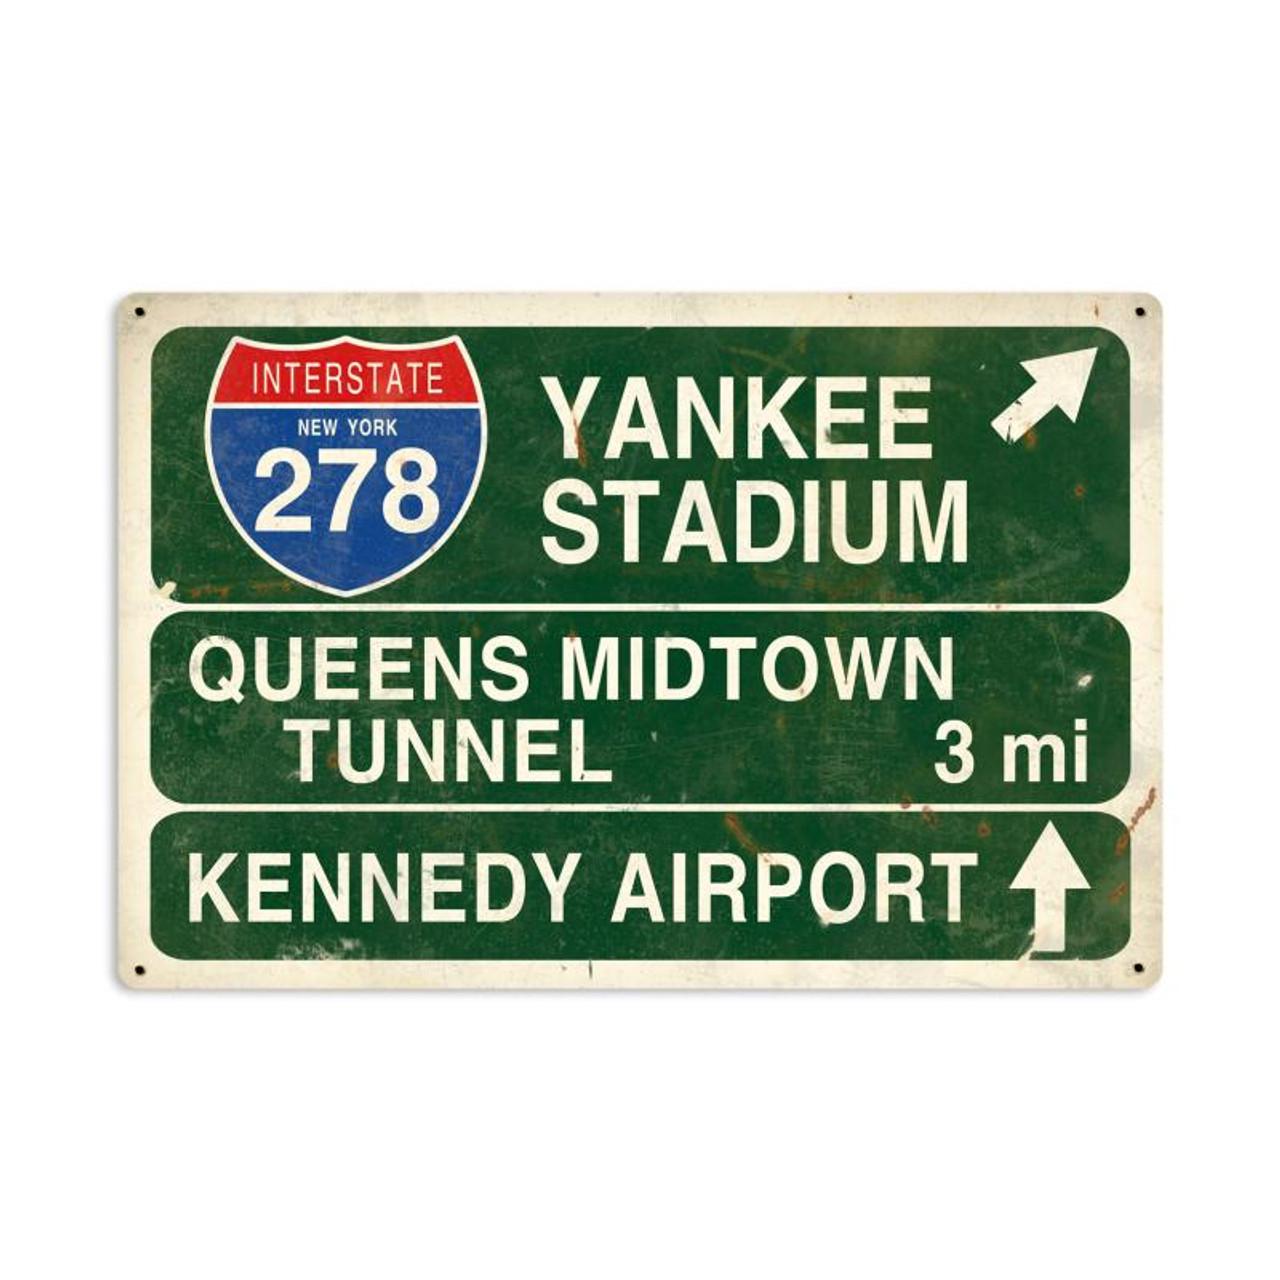 Yankee Stadium Highway Metal Sign 36 x 24 Inches